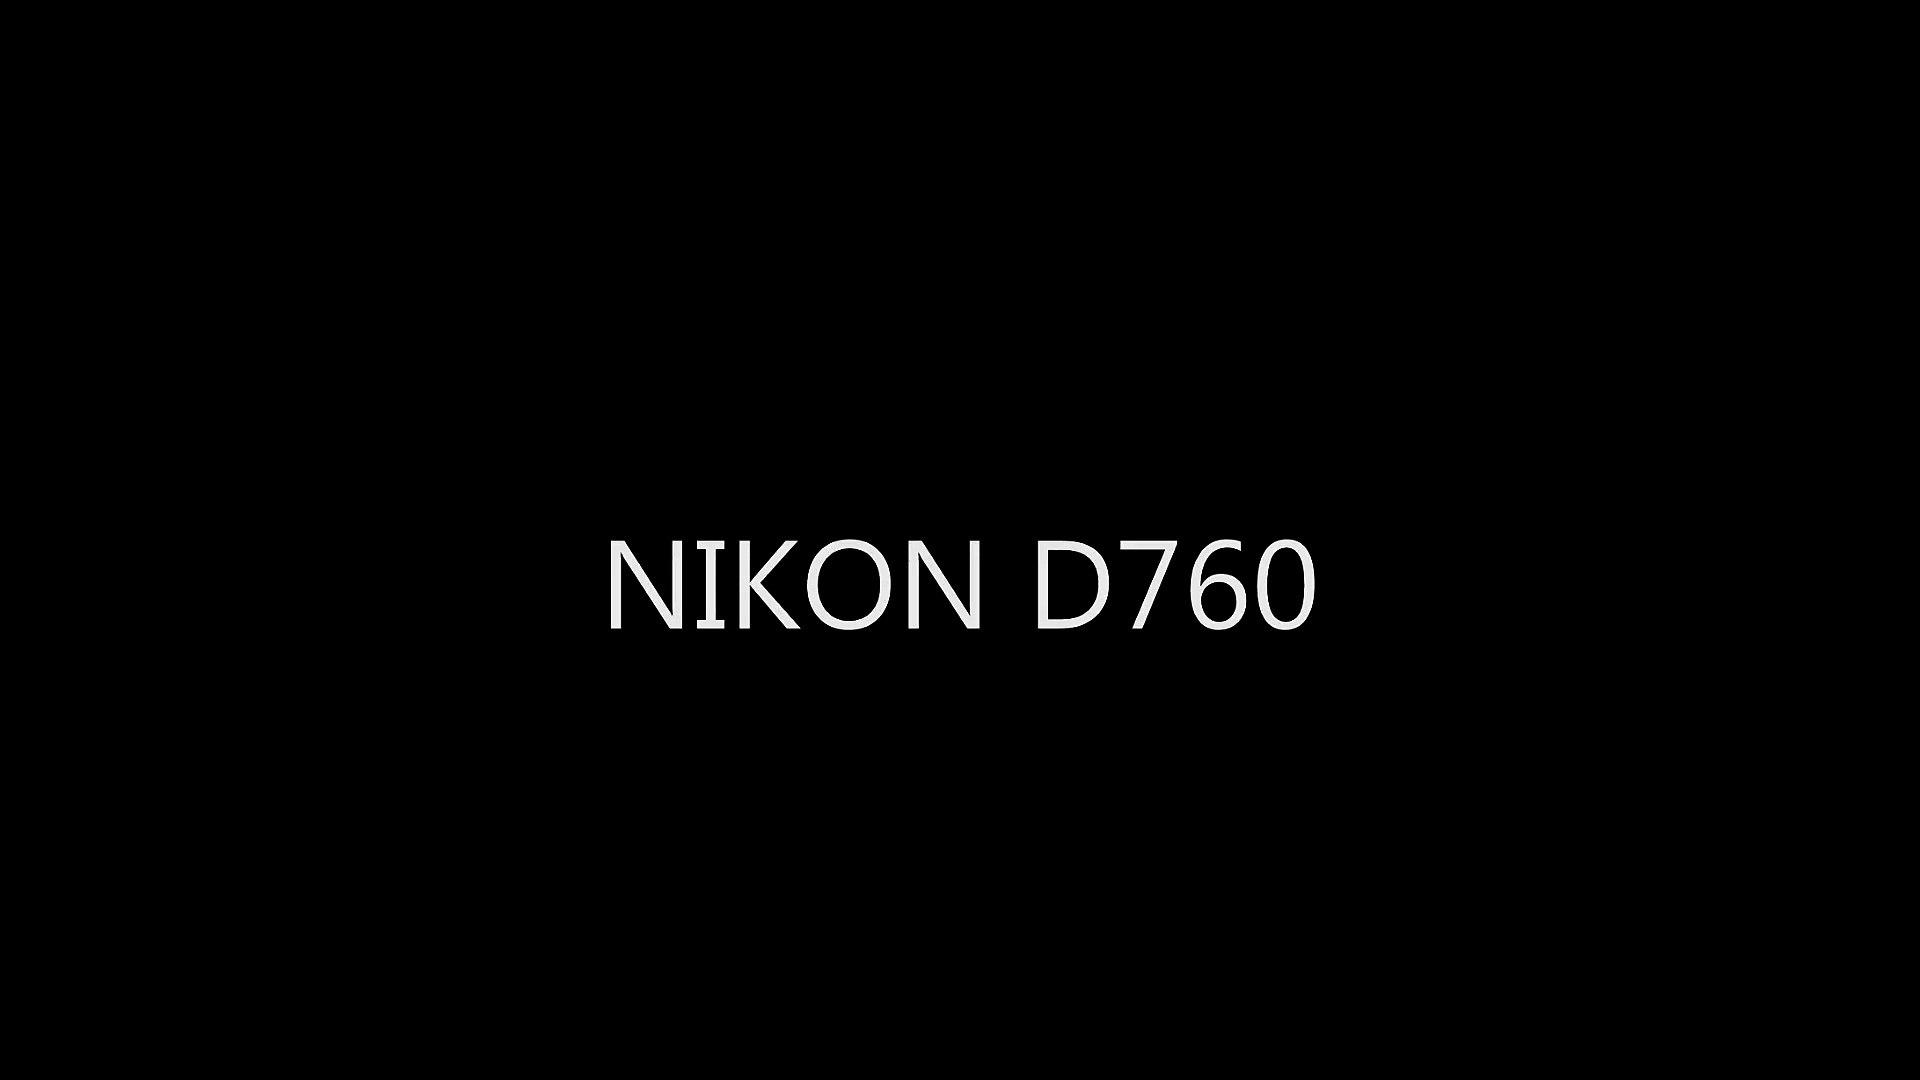 Nikon D760 is Coming